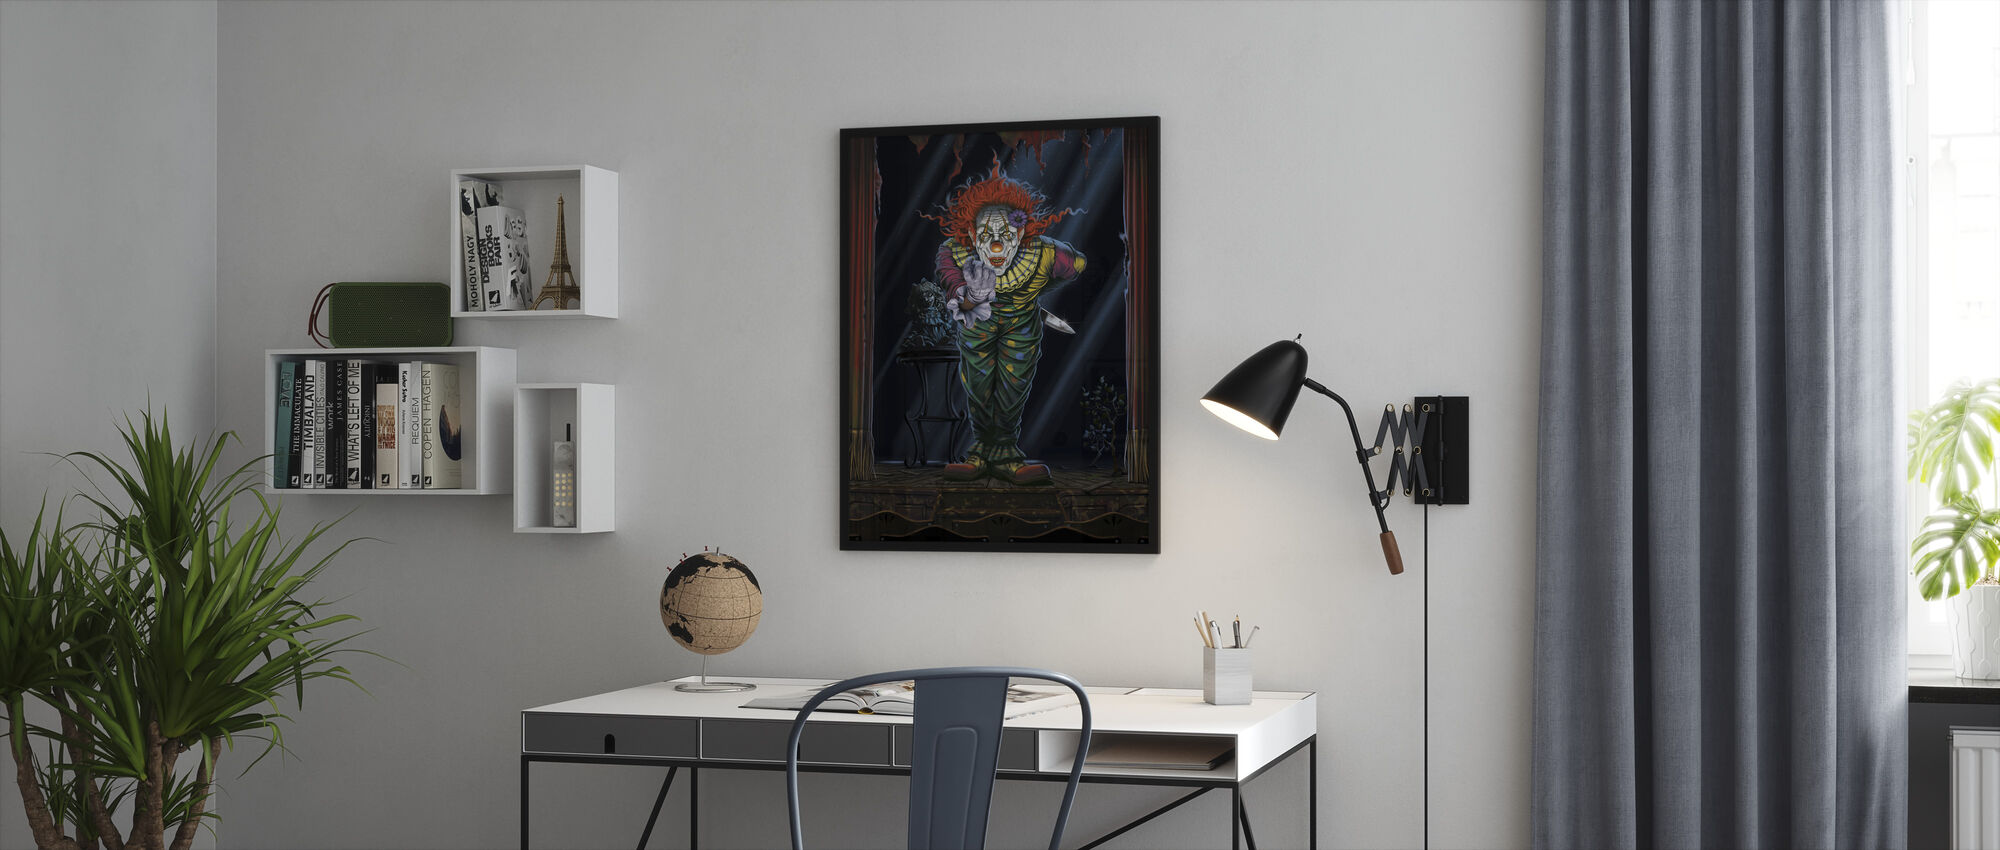 Surprise Clown - Framed print - Office